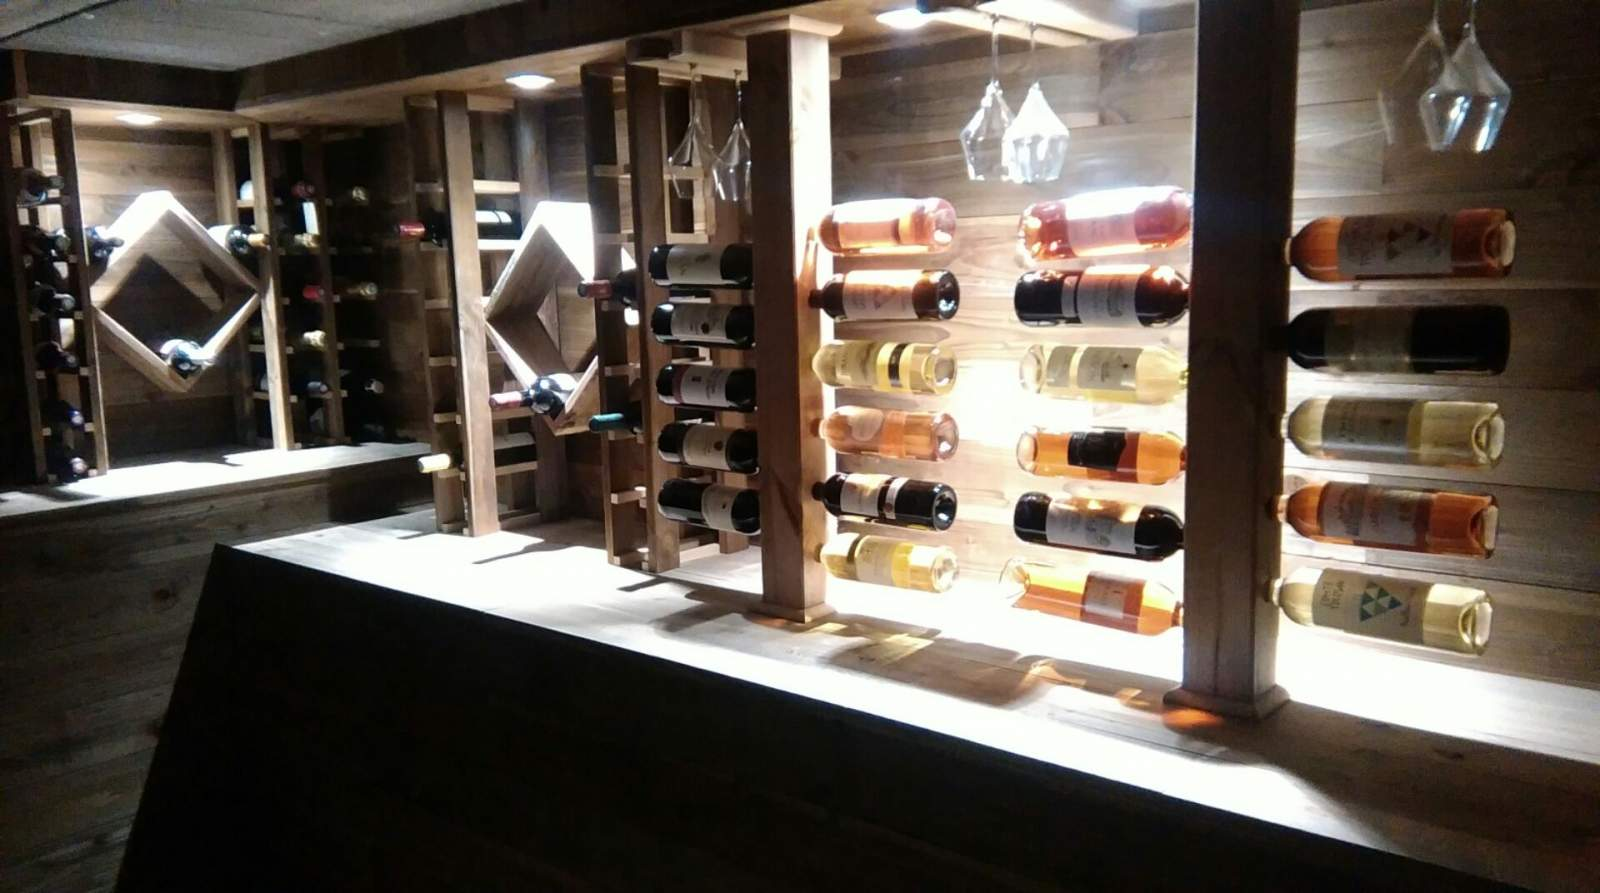 climatisation de votre votre cave vin par france. Black Bedroom Furniture Sets. Home Design Ideas